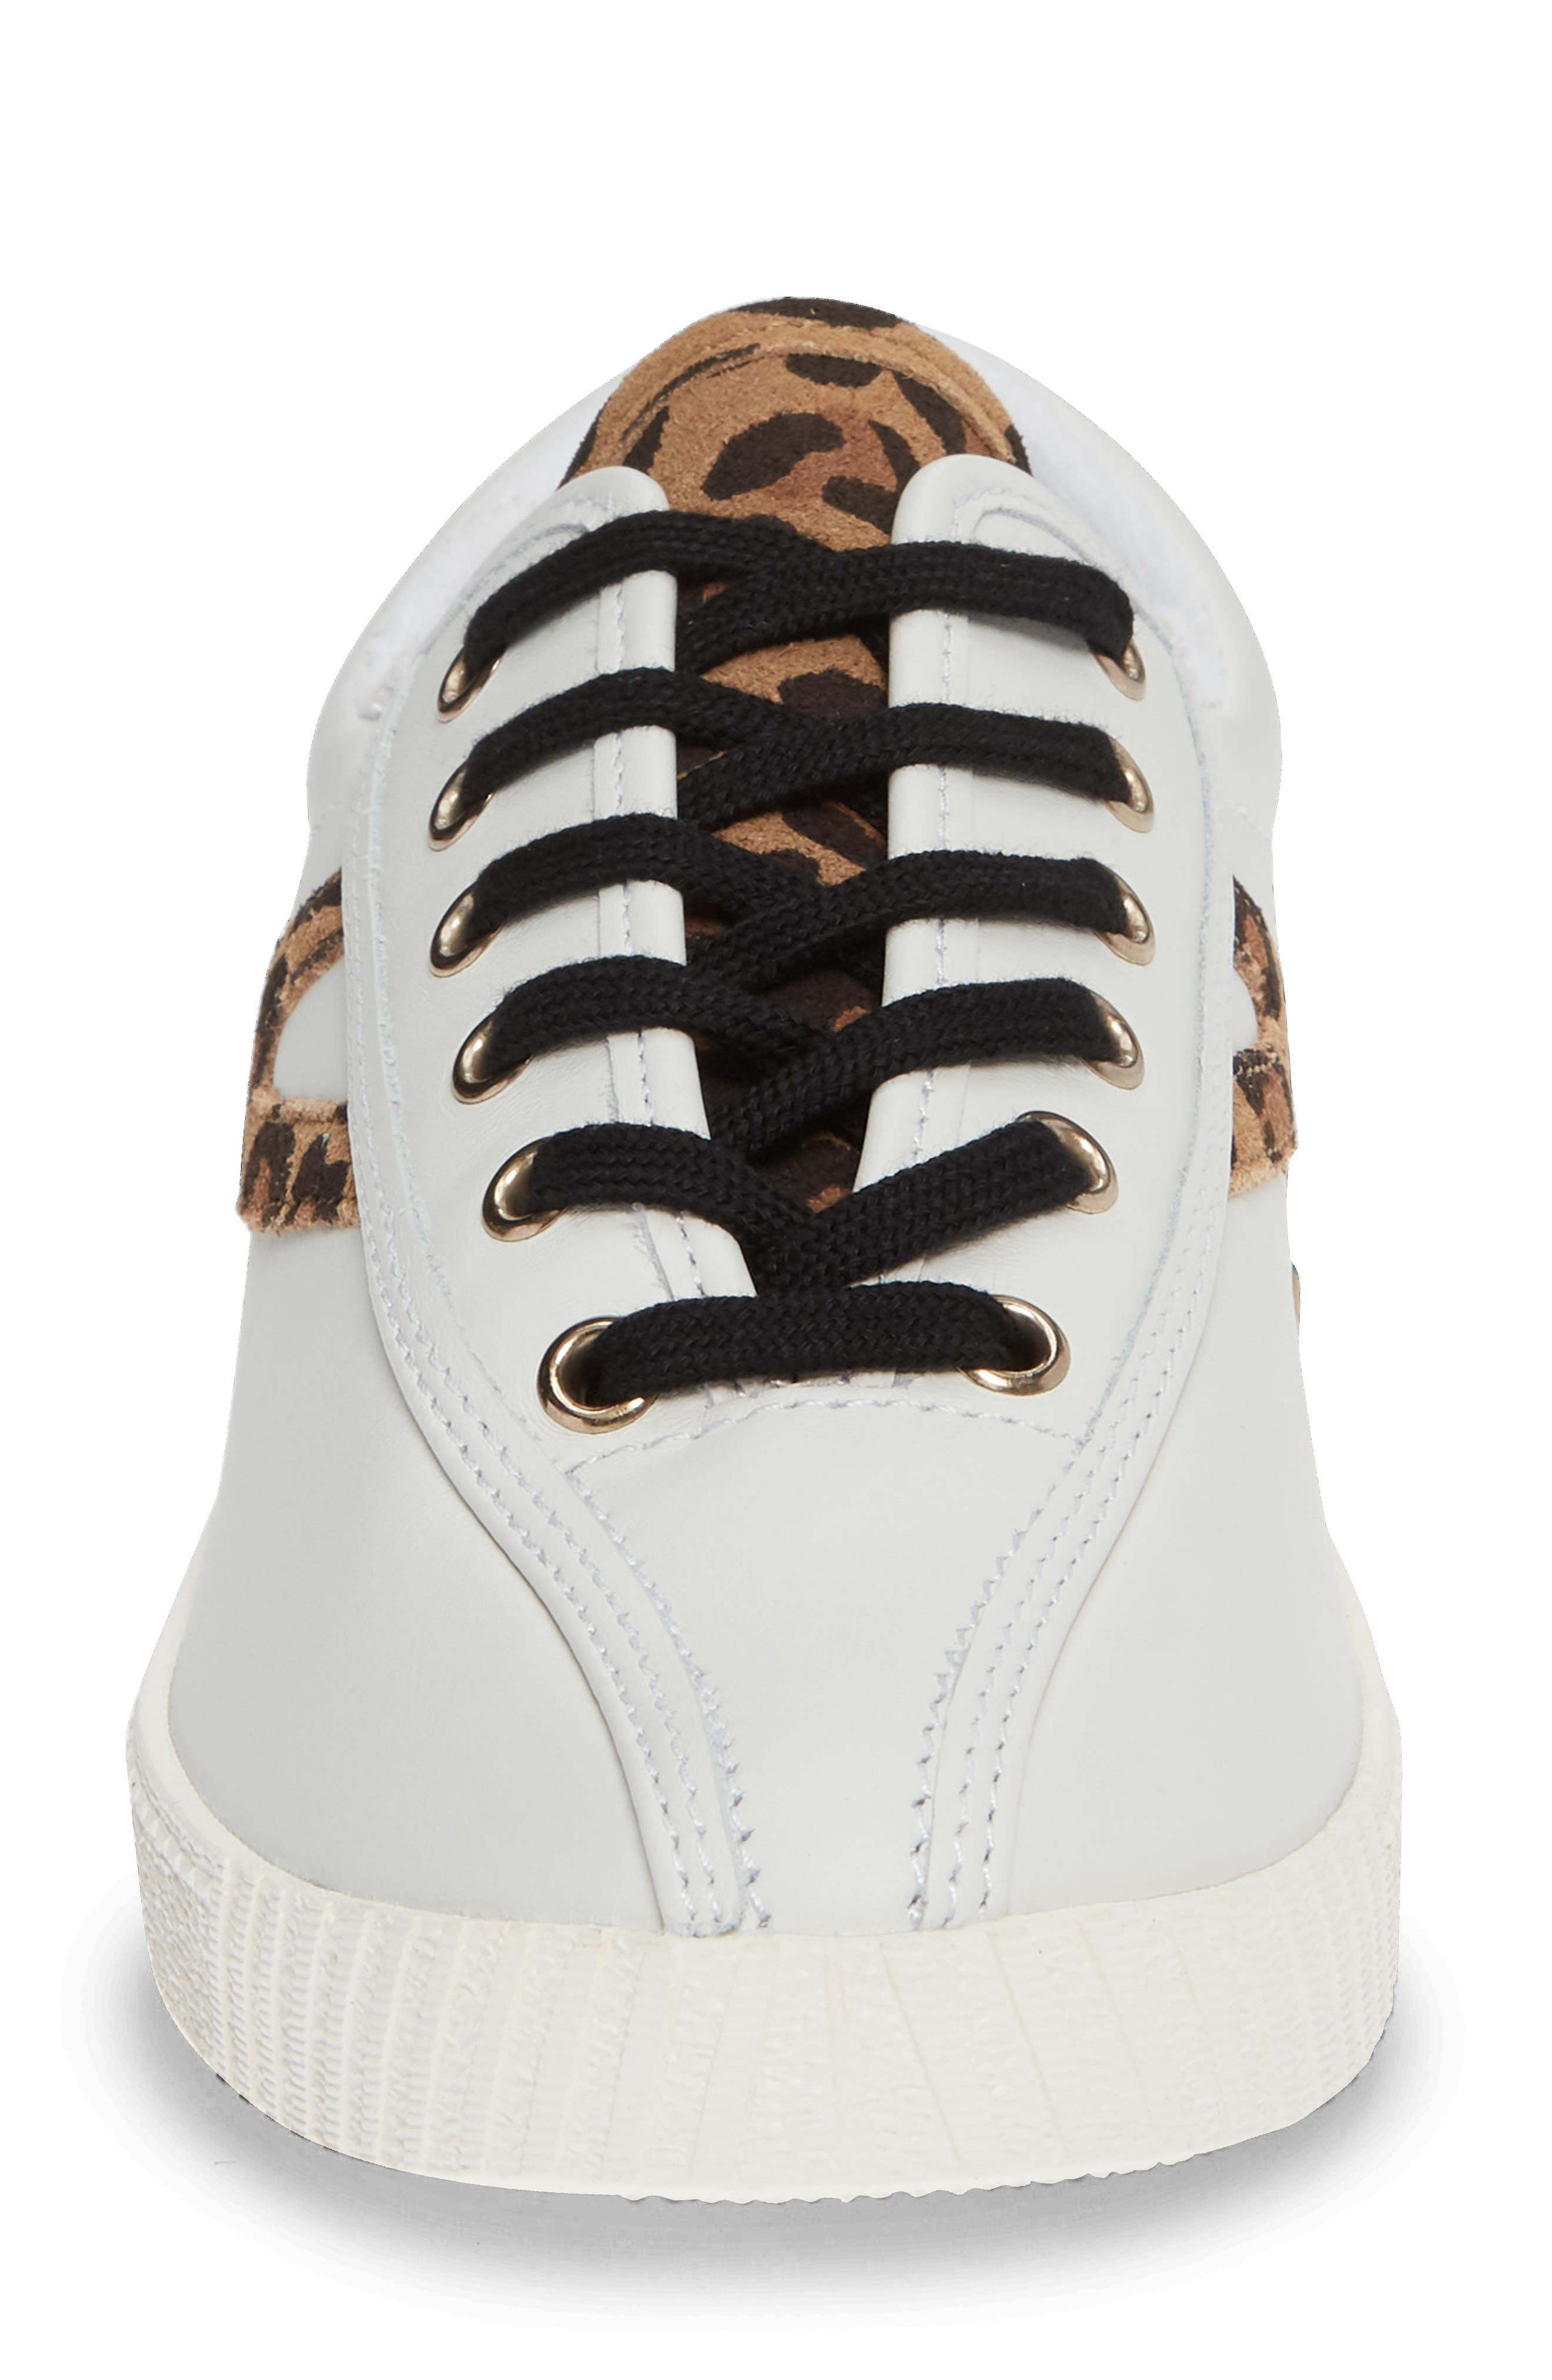 Patterned Sneaker,                             Alternate thumbnail 4, color,                             Vintage White/ Tan Multi